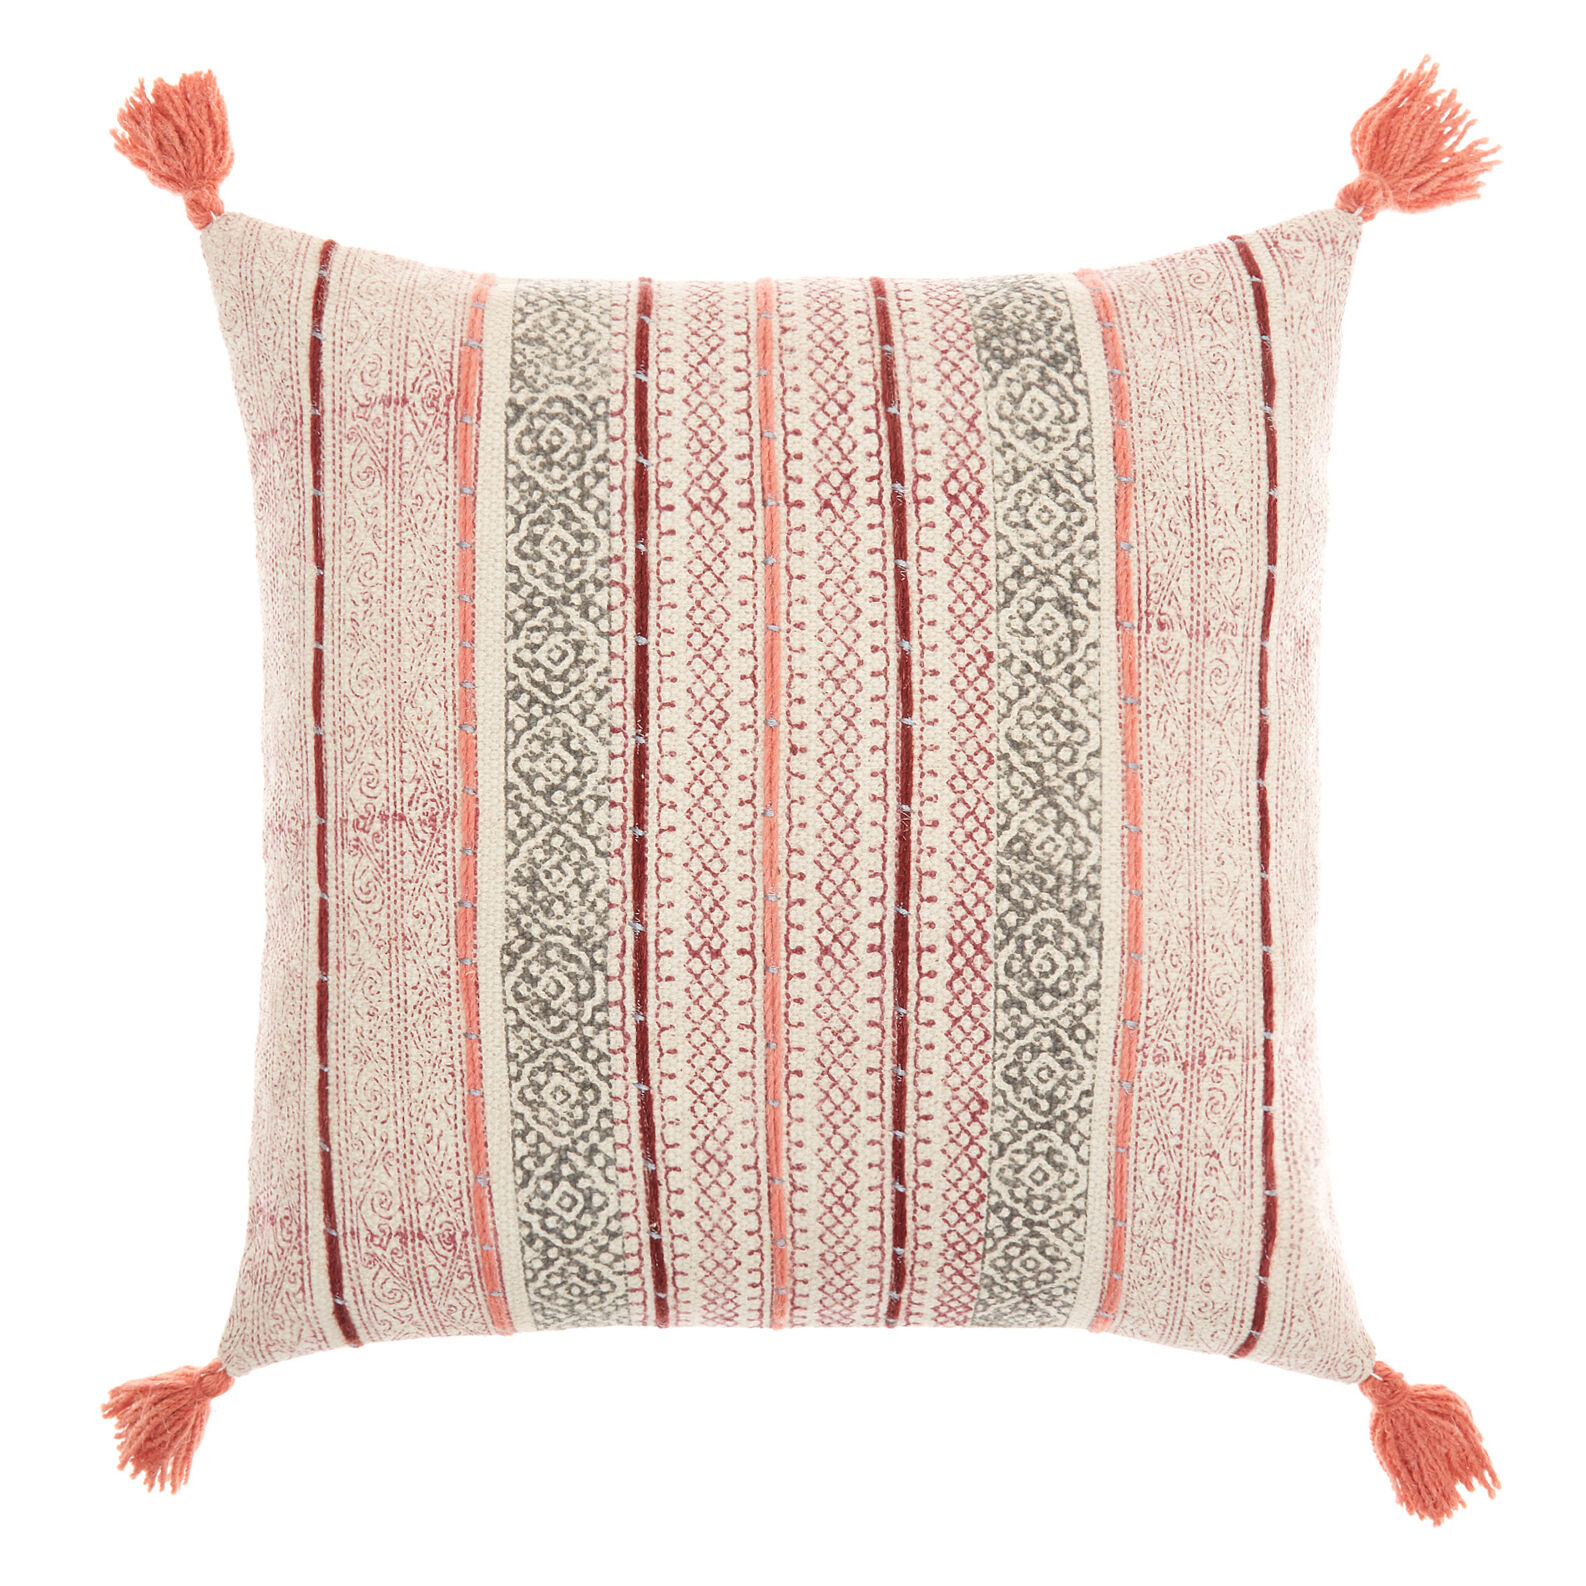 Cuscino stampato a mano motivi geometrici